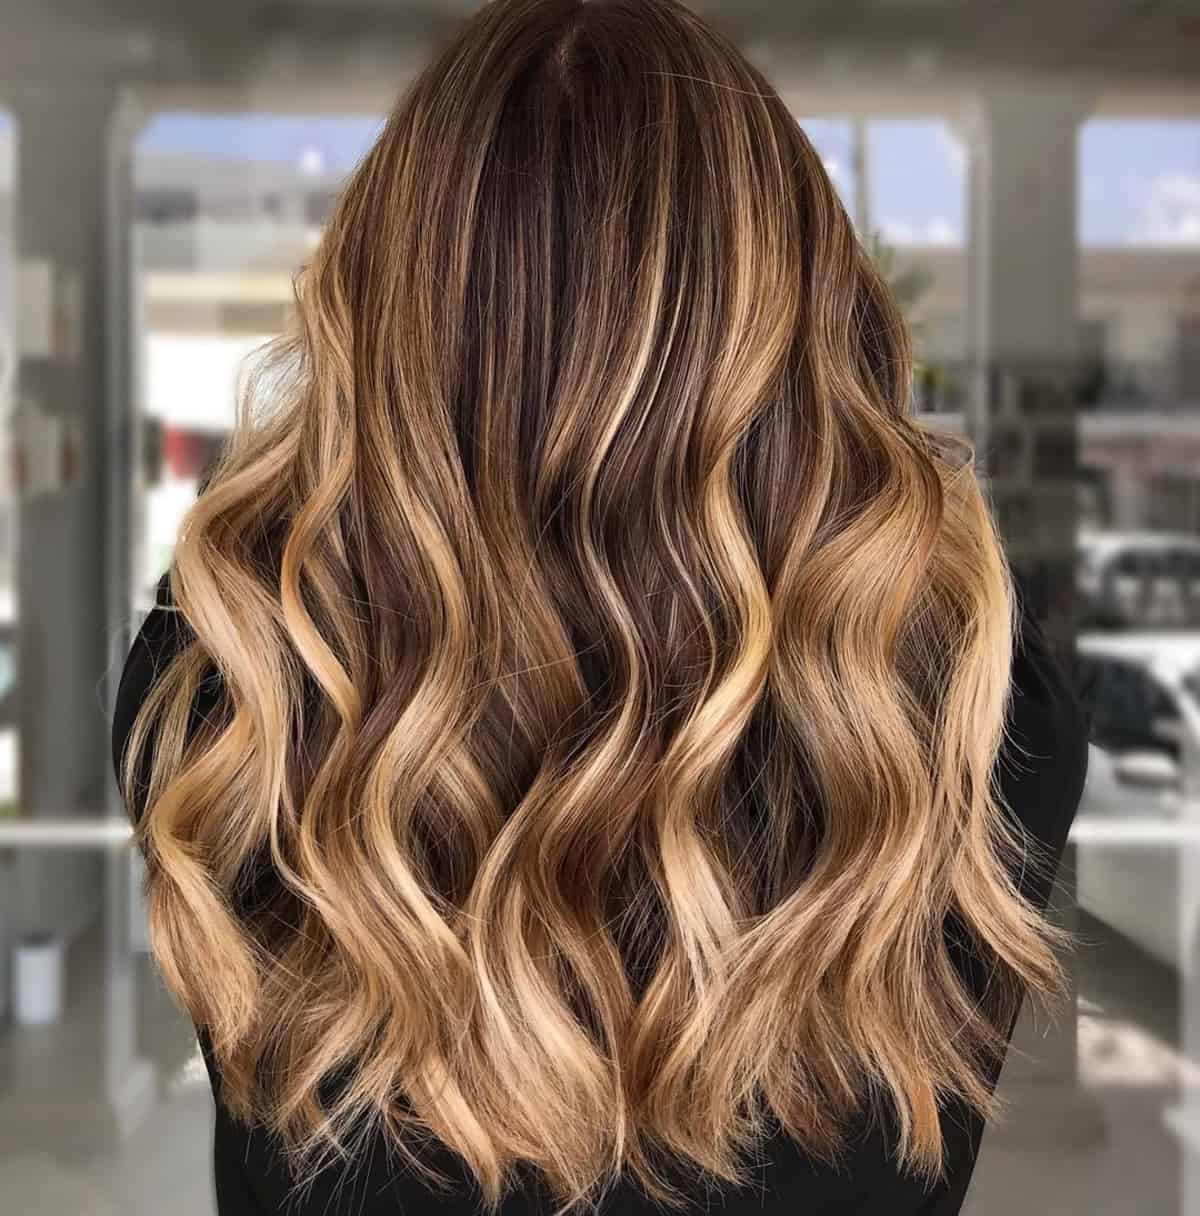 Dark and light honey blonde hair color